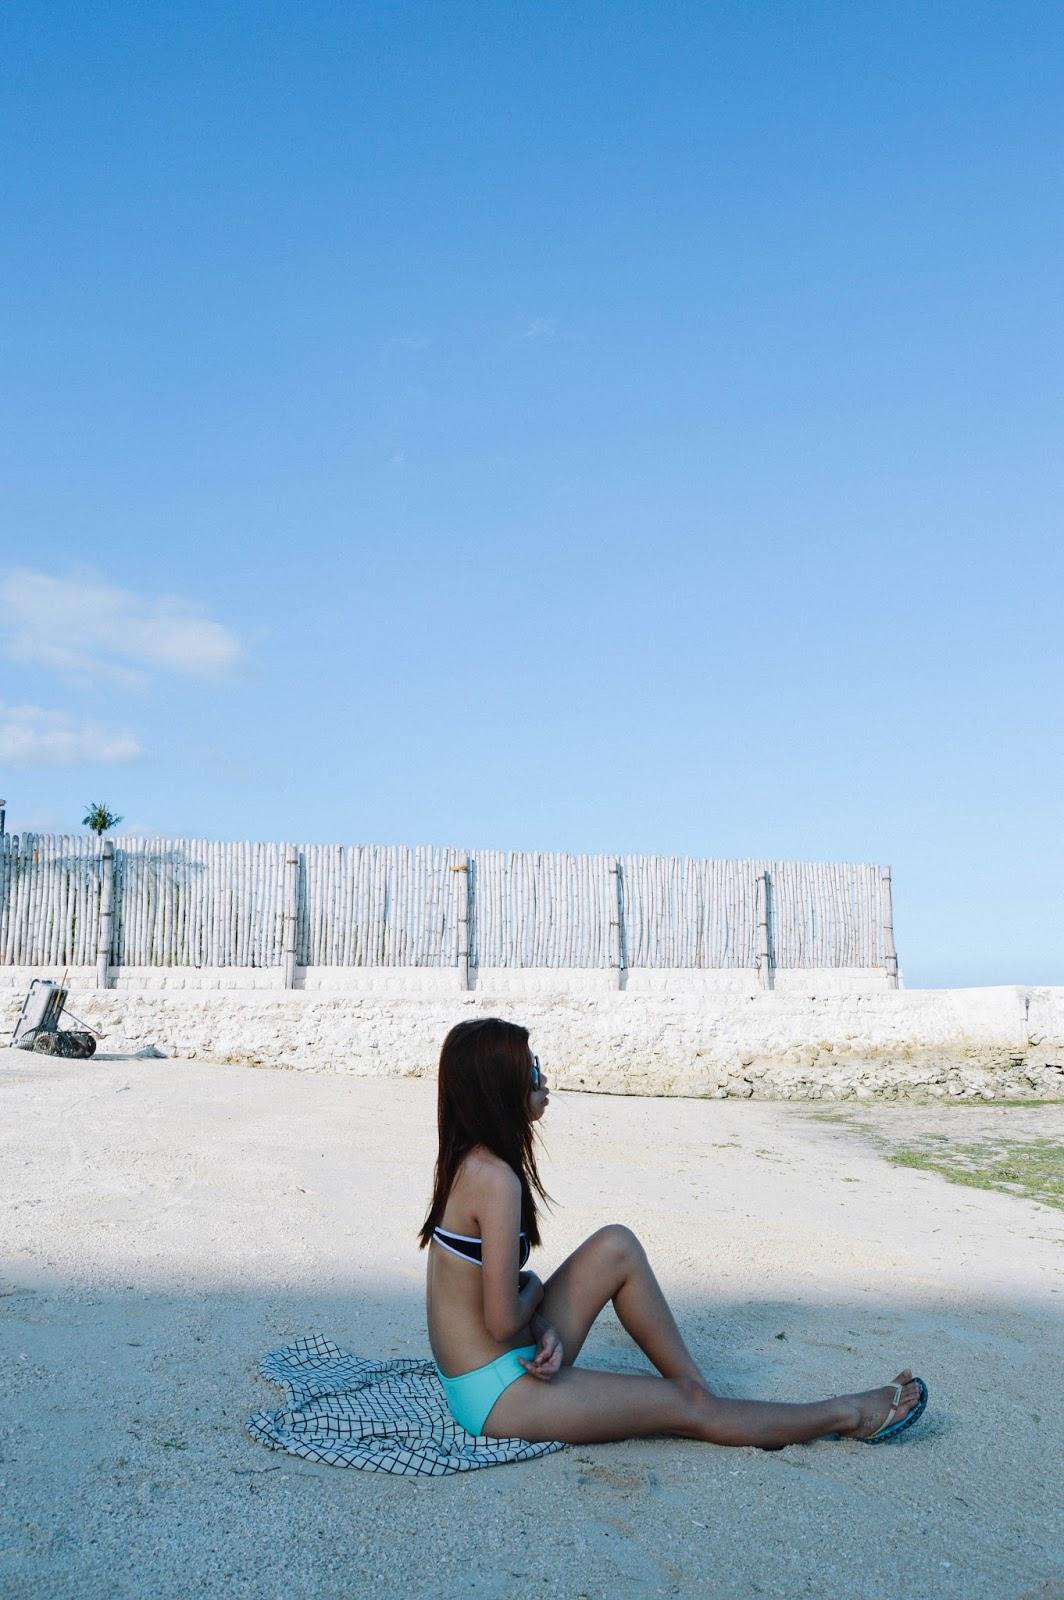 triangl swimwear cebu, summer ootd, summer breeze, chill summer, summer, chill, Costabella Beach Resort, How to edit instagram photos, fashion blogger, style blogger, cebu blogger, cebu style blogger, blogger, filipina blogger, cebuana blogger, nested thoughts, katherine cutar, katherine anne cutar, katherineanika, katherine annika, ootd, ootd pilipinas, summer 2015, philippines summer 2015, philippines summer, cebu summer, cebu summer 2015, costabella cebu, triangl swimwear, triangl cebu, triangl, triangl swimwear philippines, bikini ph, bikini cebu